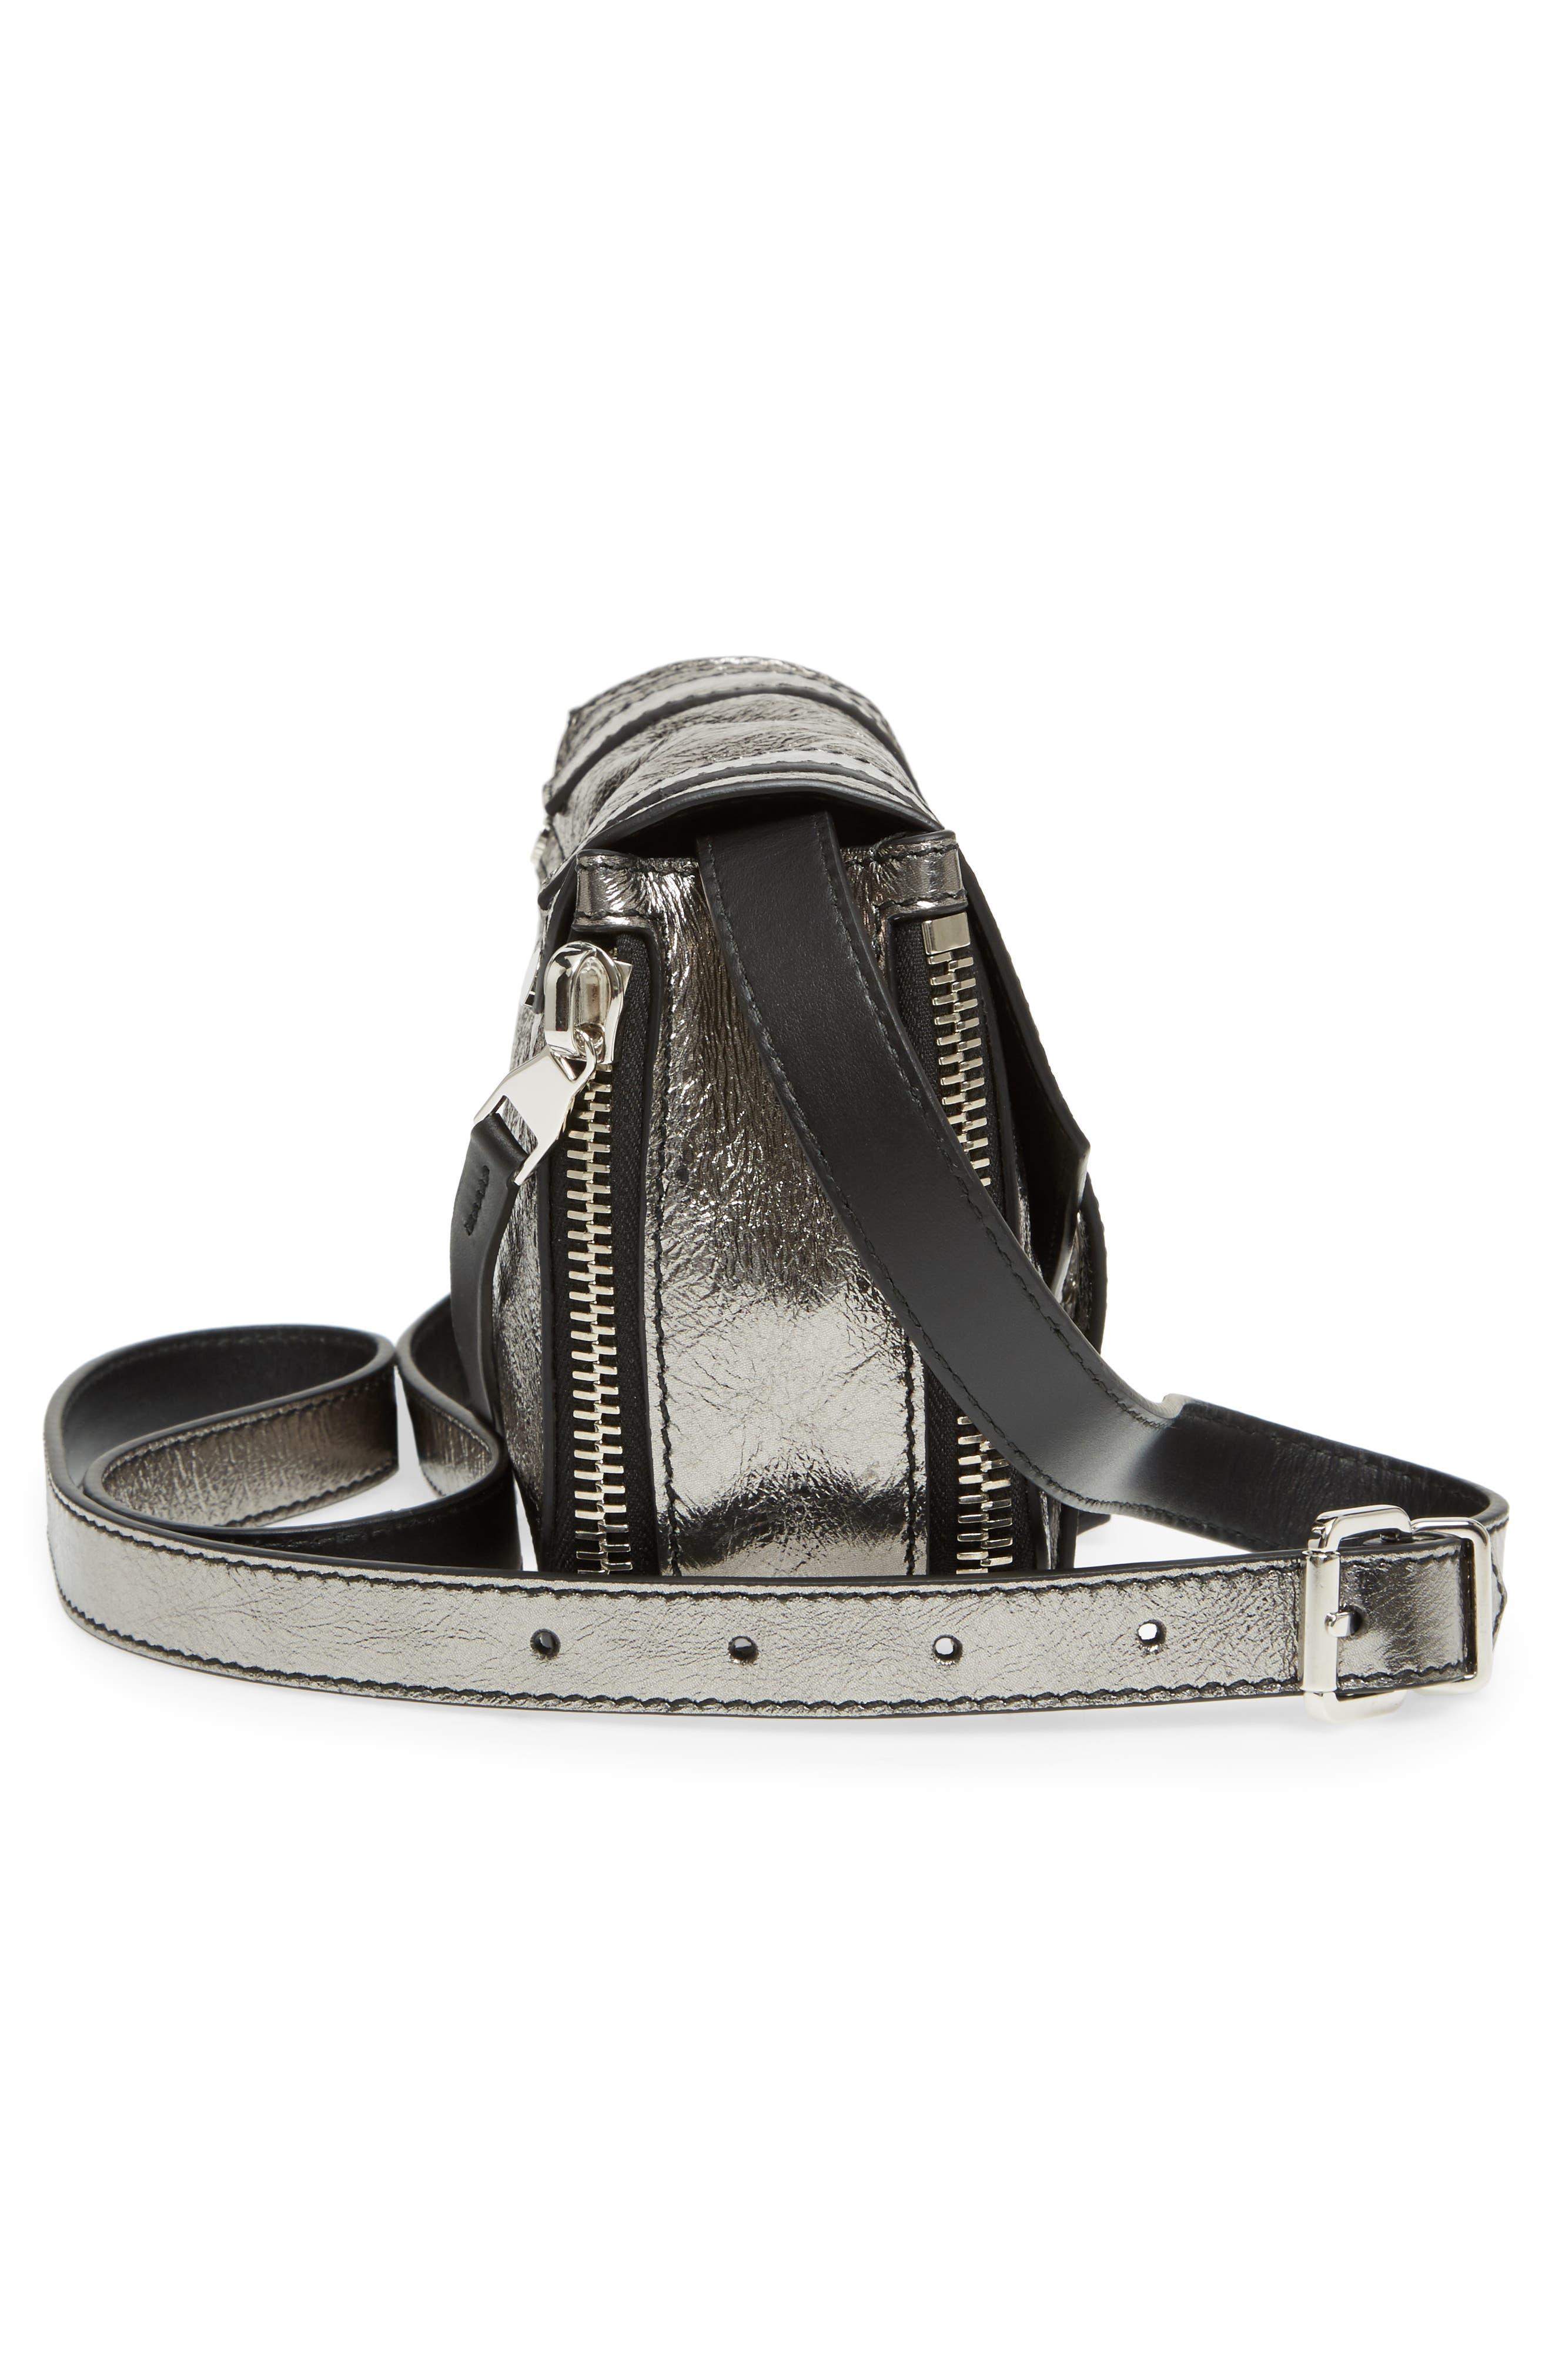 Mini PS1 Metallic Leather Crossbody Bag,                             Alternate thumbnail 5, color,                             040